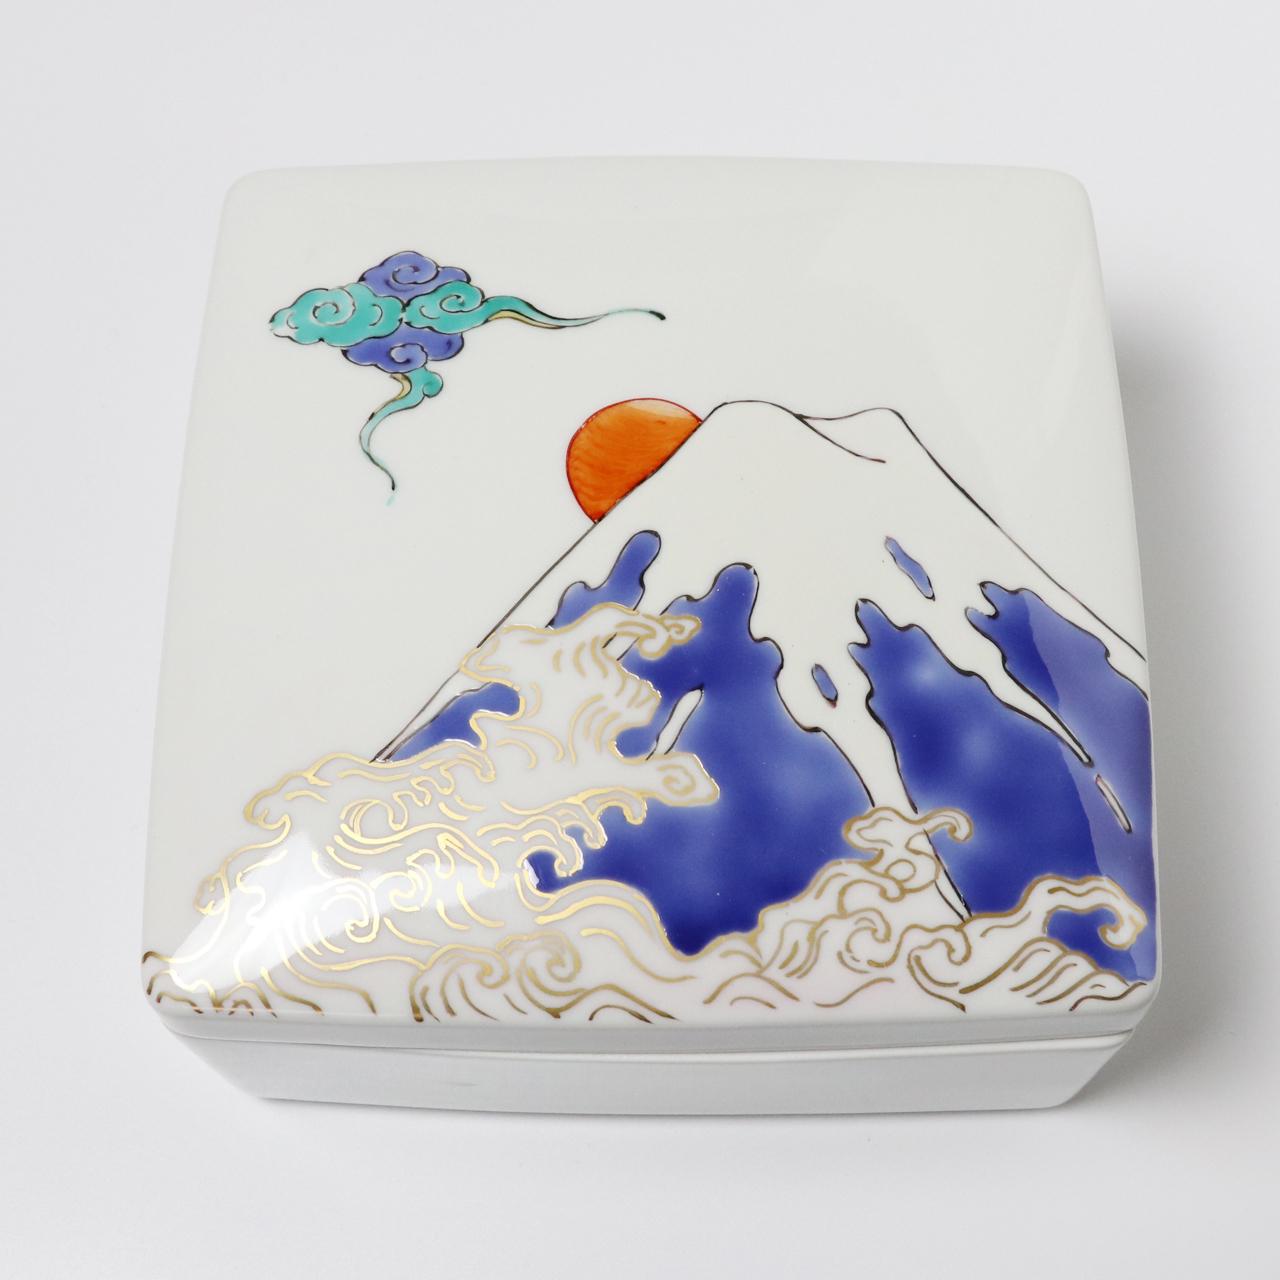 陶箱 波と富士